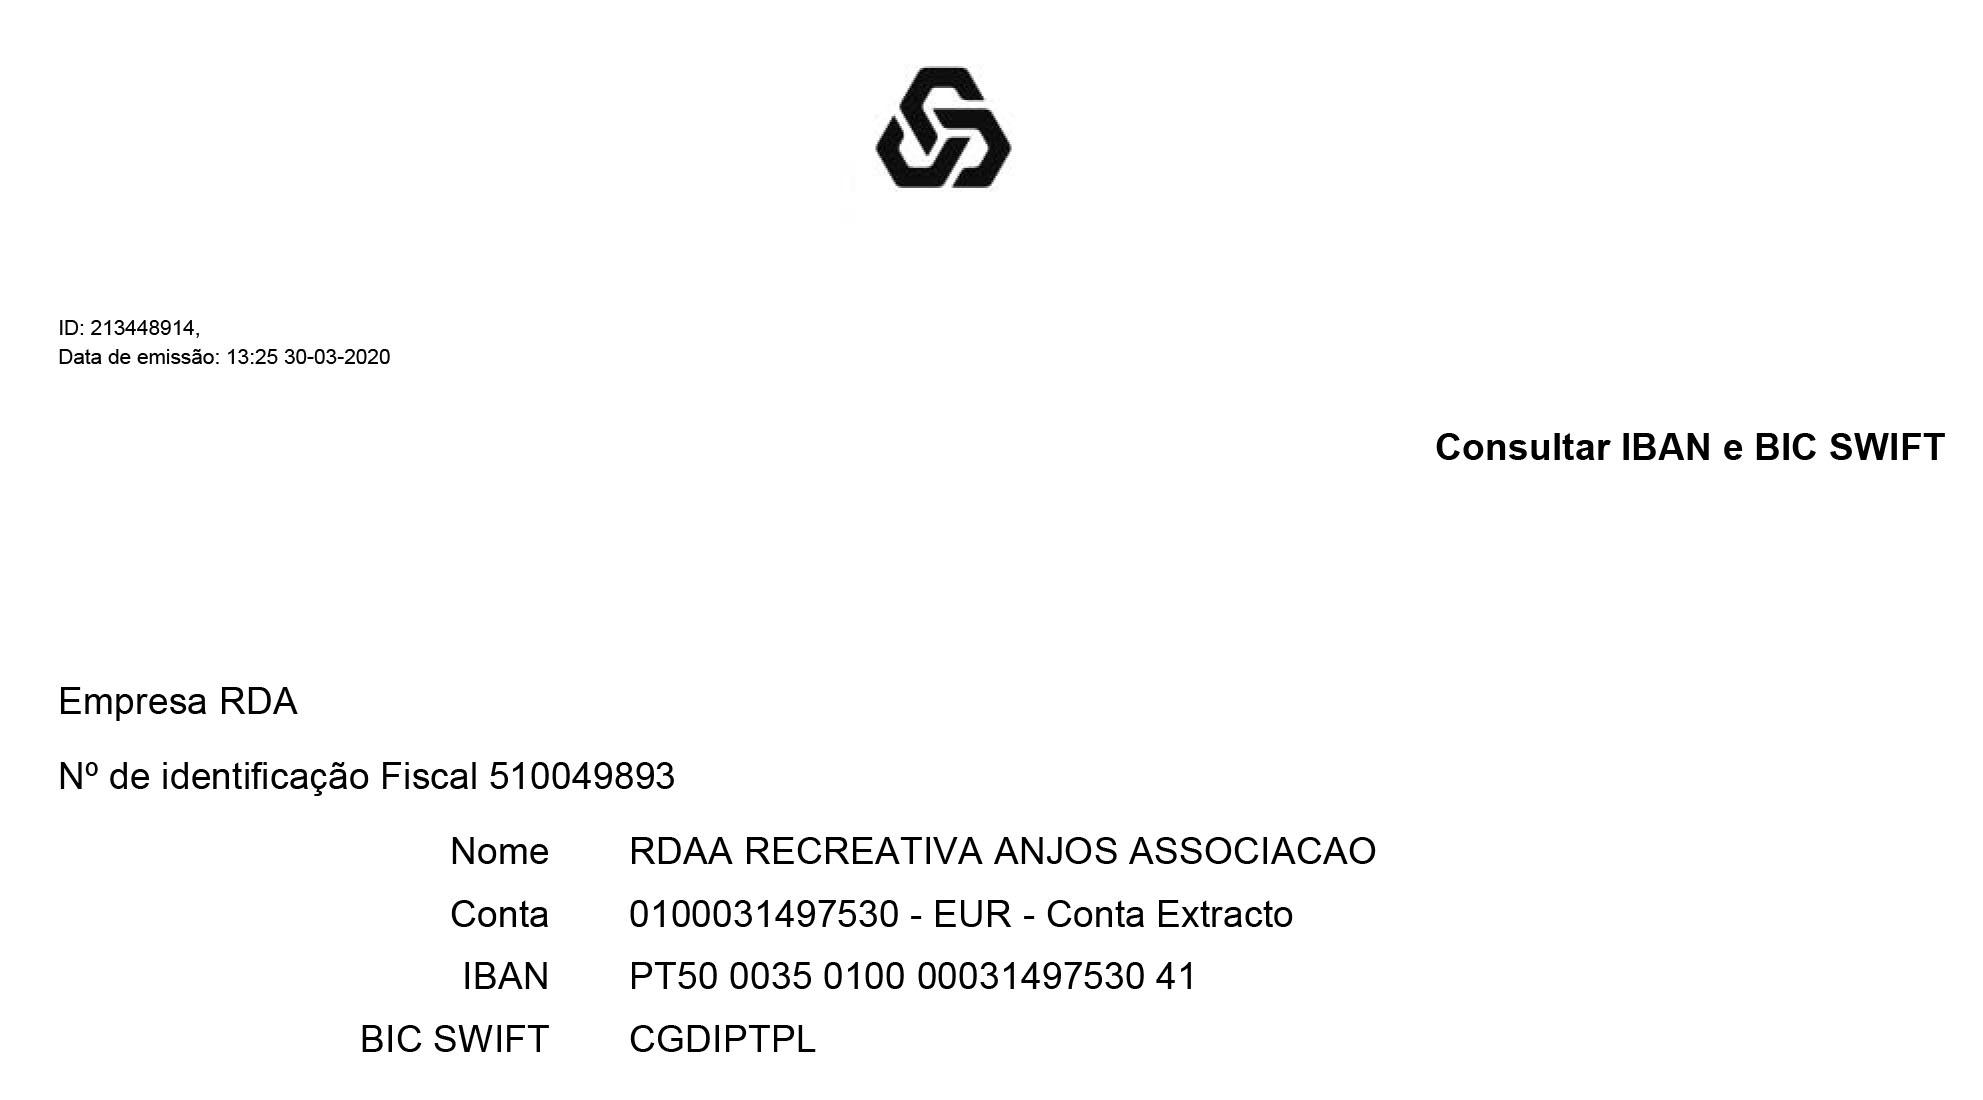 IBAN RDA69: PT50 0035 0100 0003 1497 5304 1